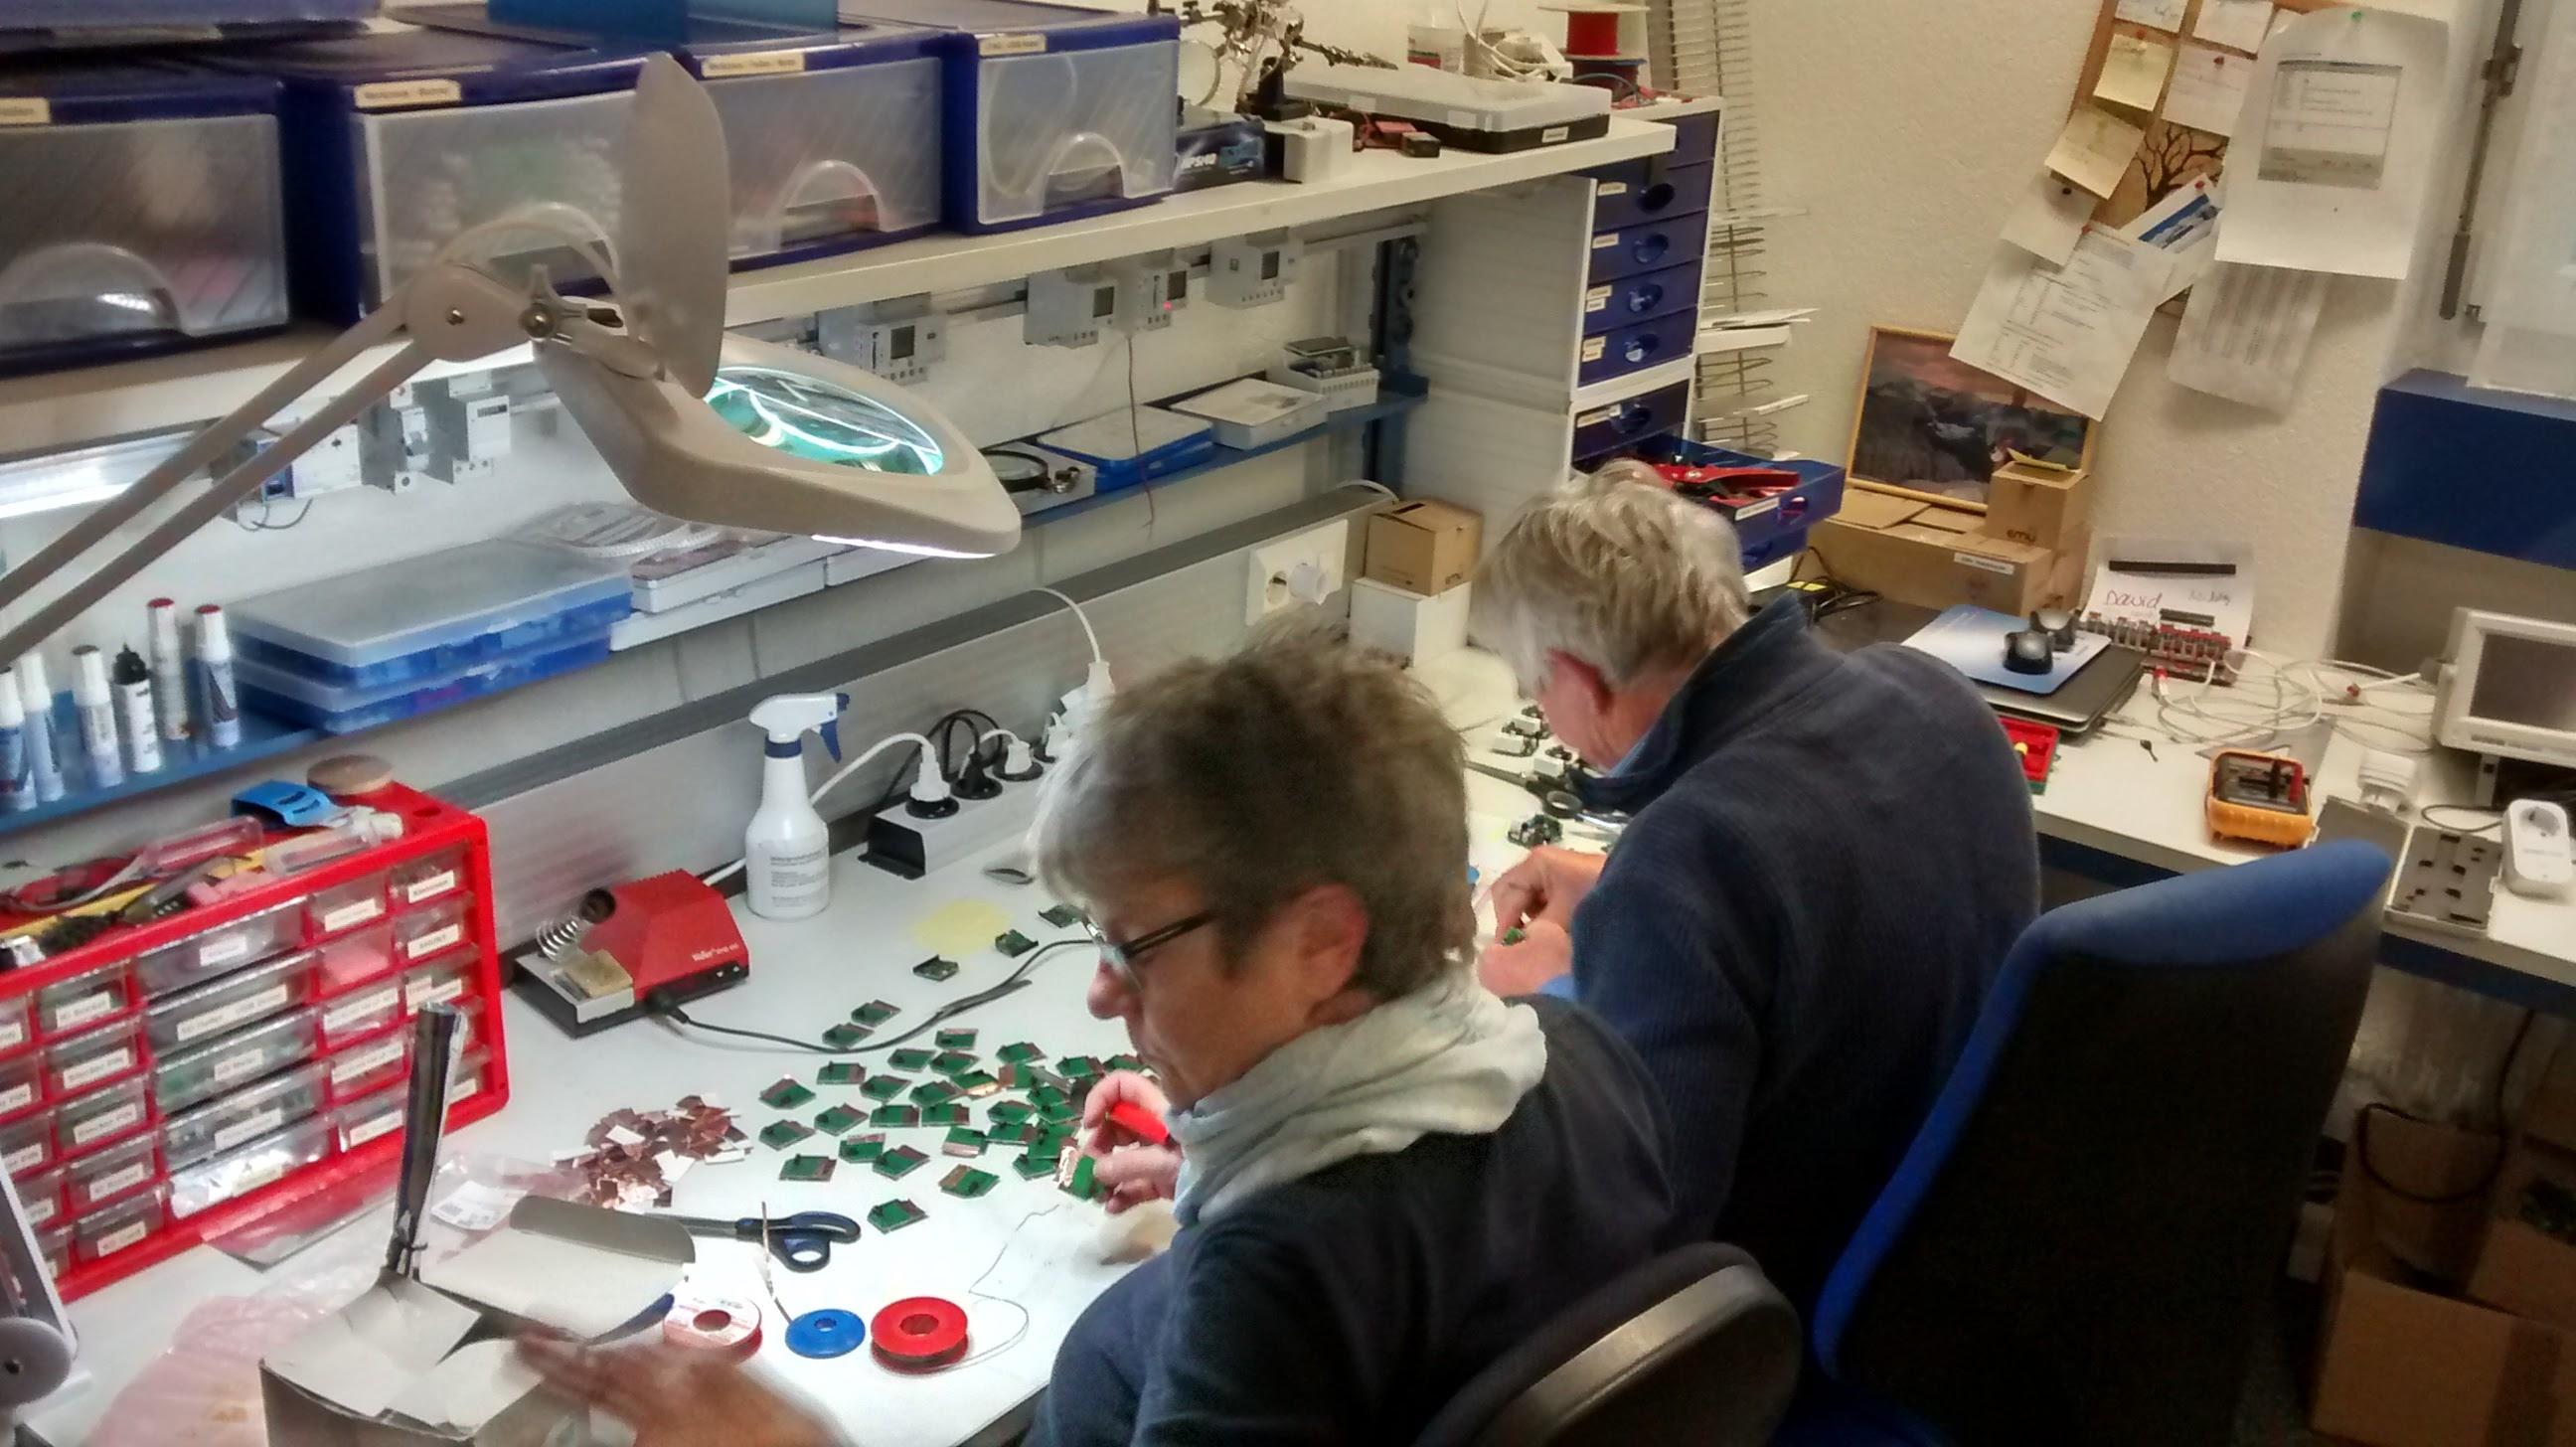 Produktion der smart-me Plugs in Rickenbach